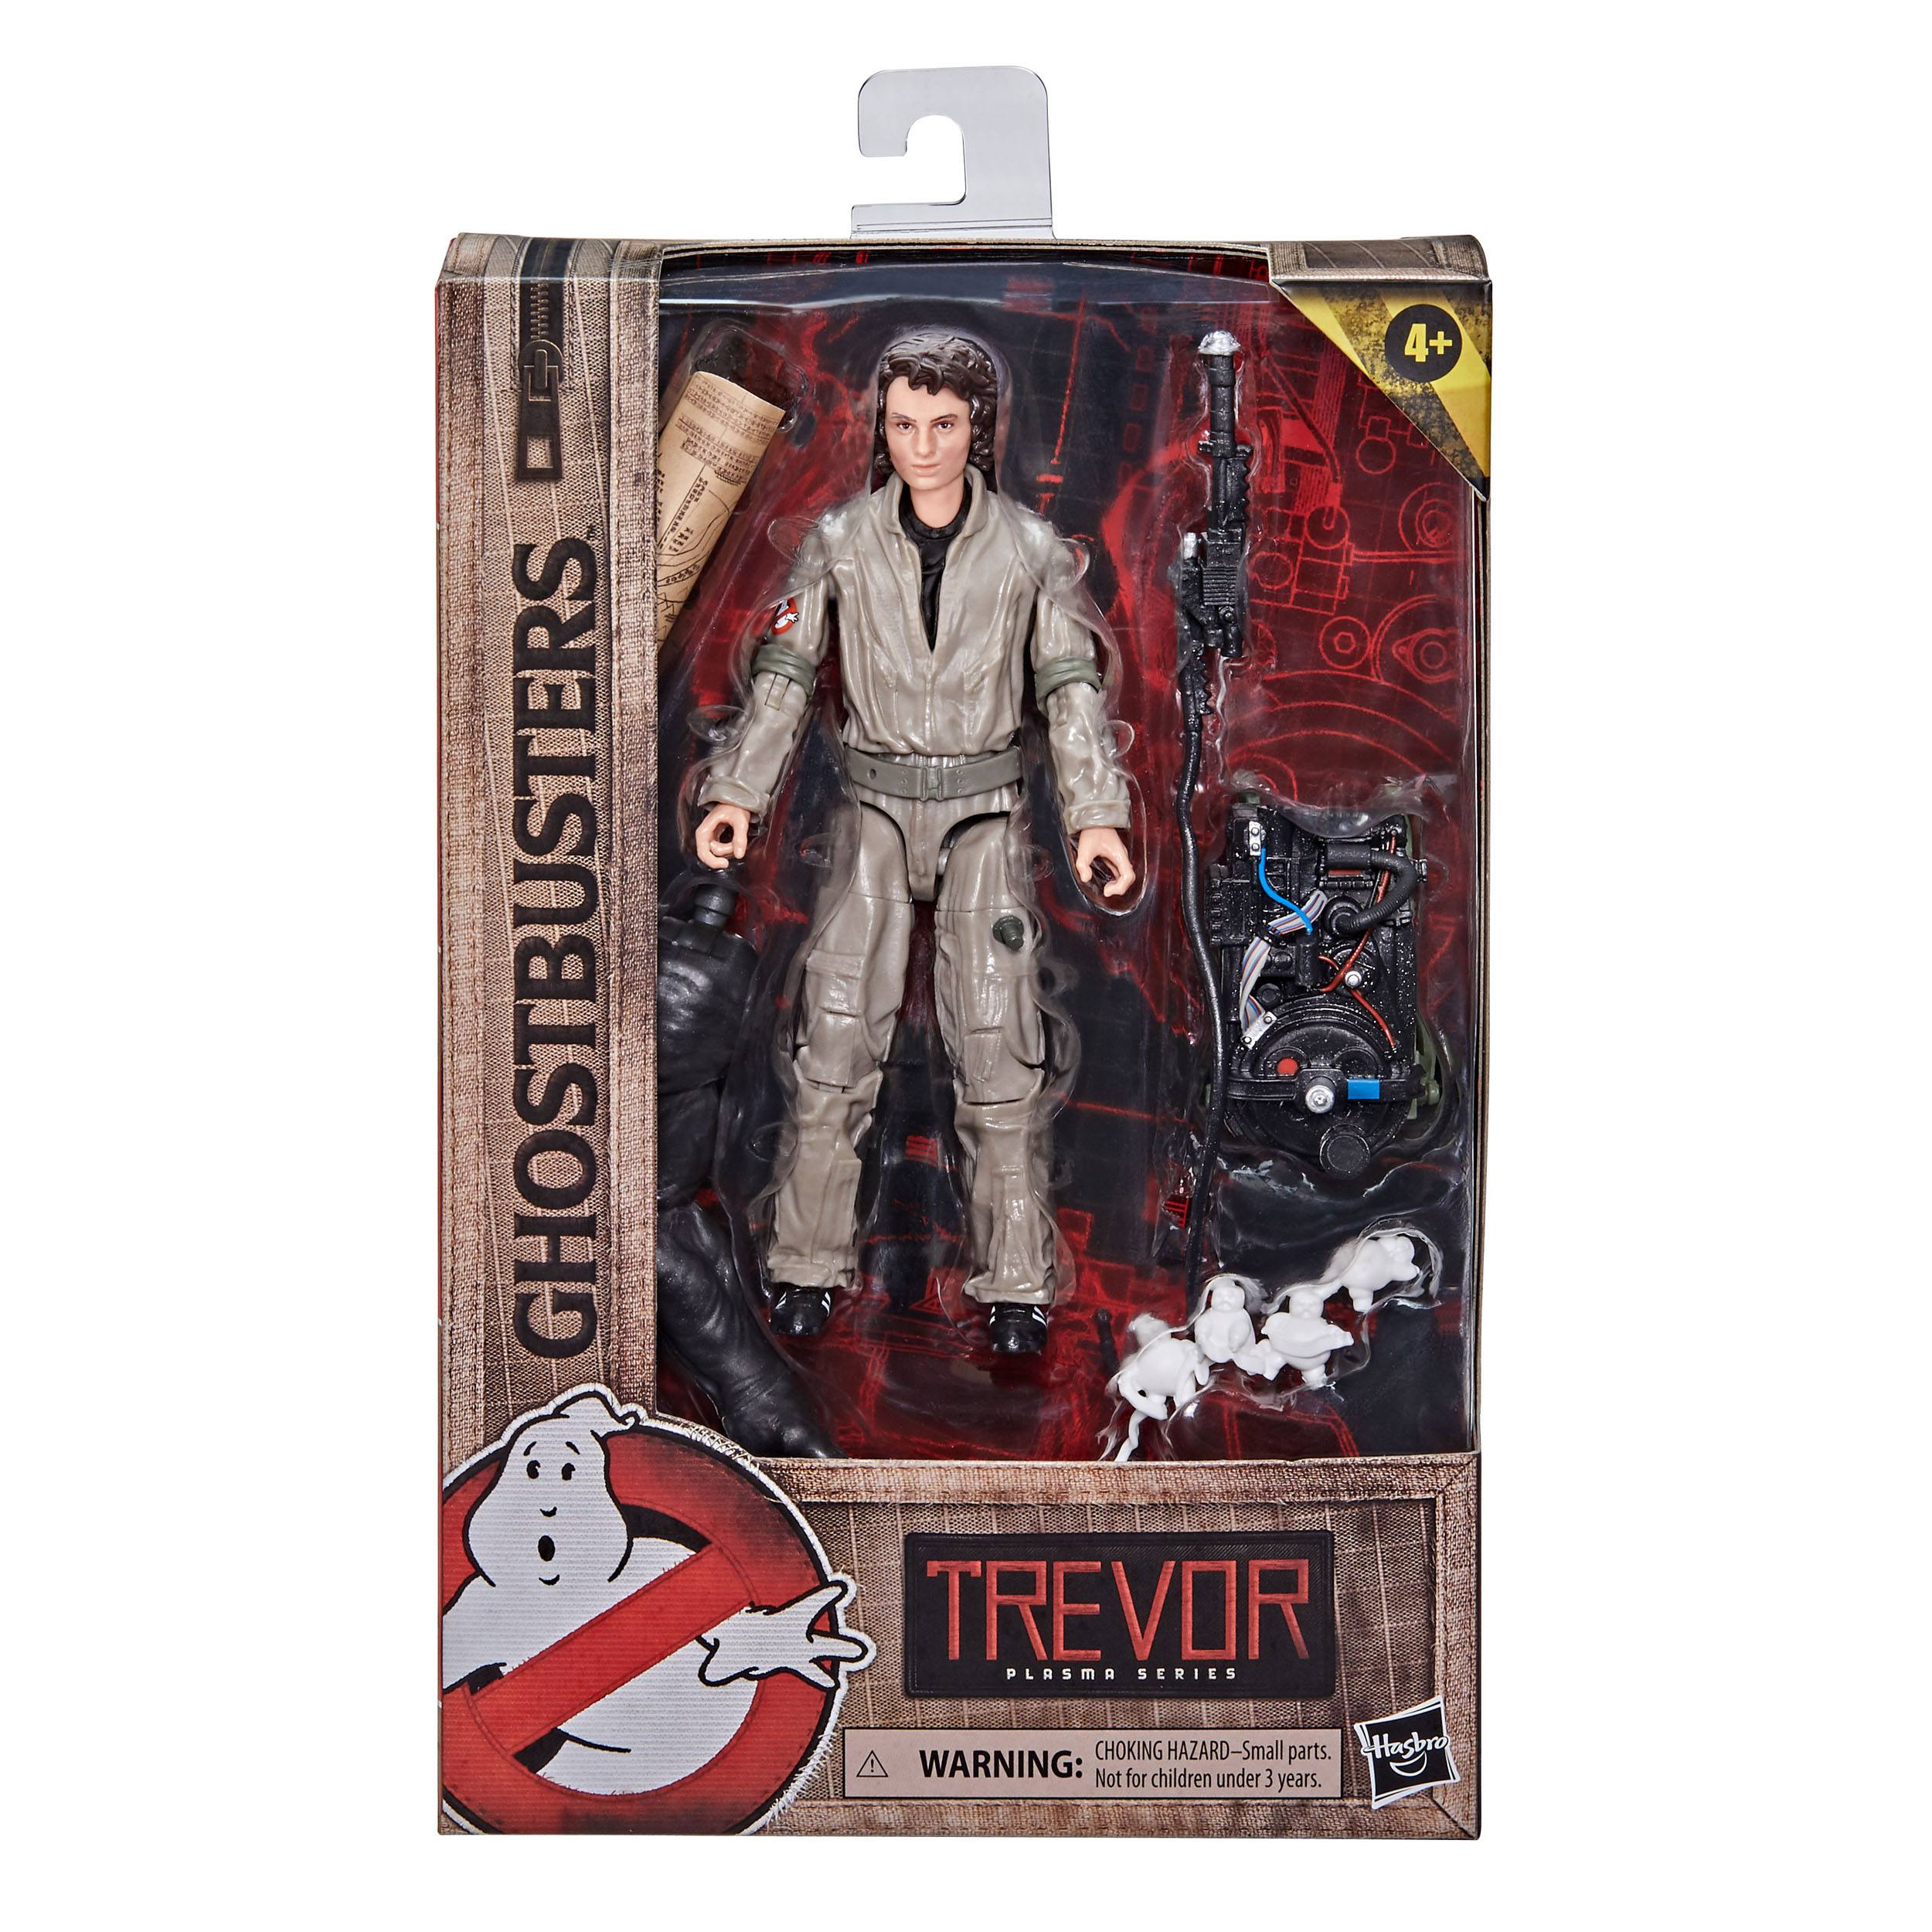 Ghostbusters Plasma Series Ghostbusters: Afterlife Trevor  5010993853250